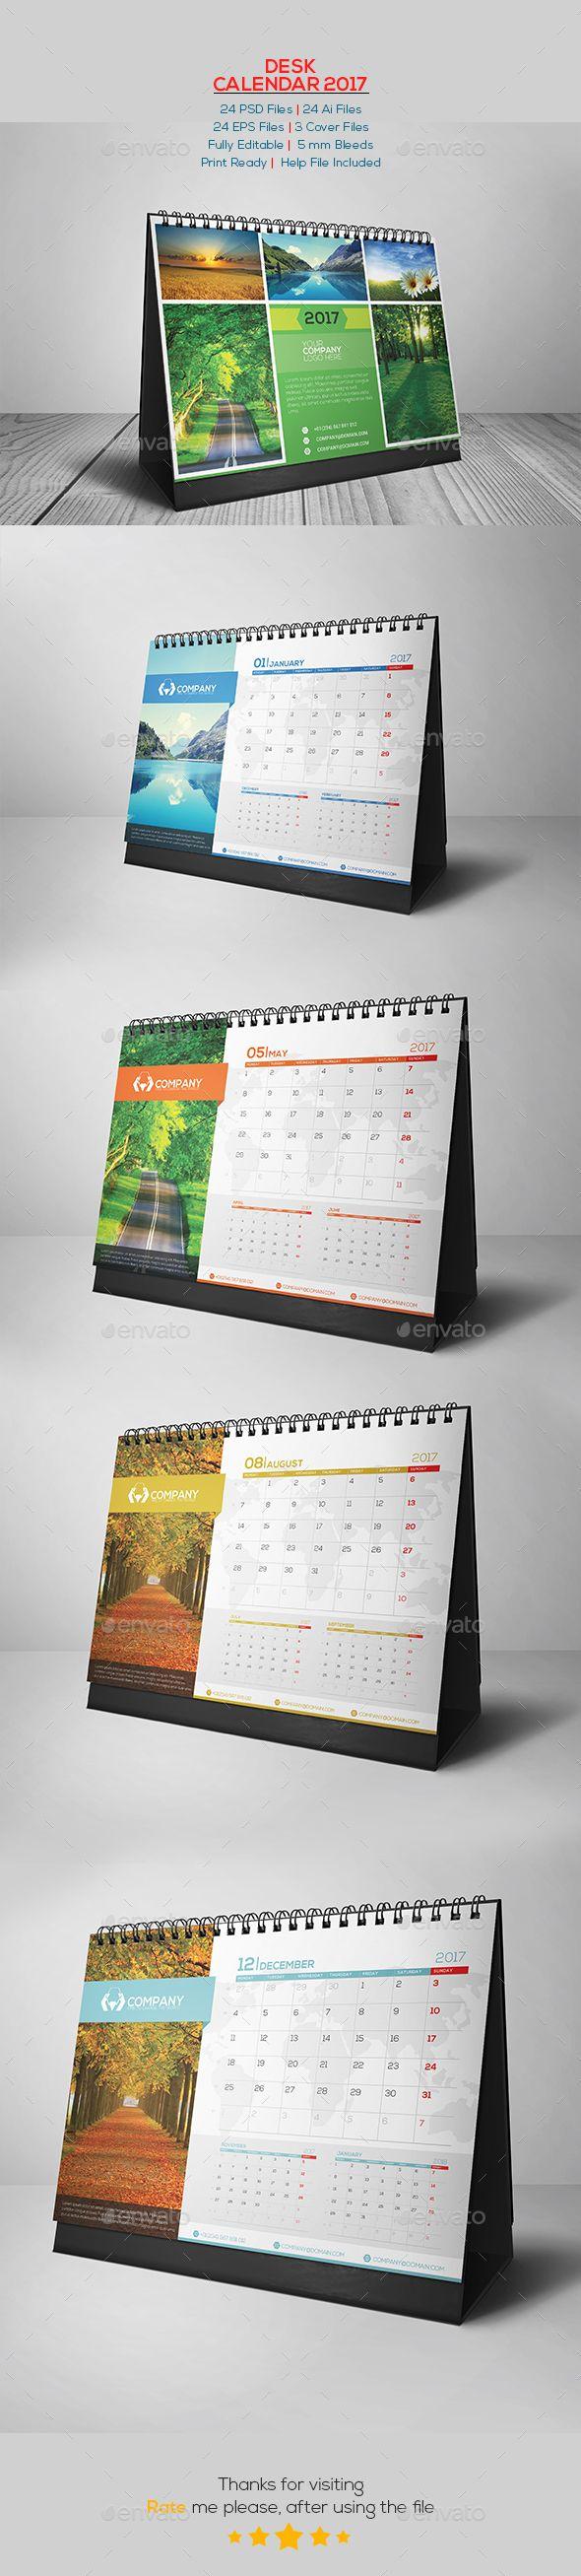 Desk Calendar 2017 v.01  — PSD Template #inspiration #week starts saturday #calendar • Download ➝ https://graphicriver.net/item/desk-calendar-2017-v01/18606151?ref=pxcr